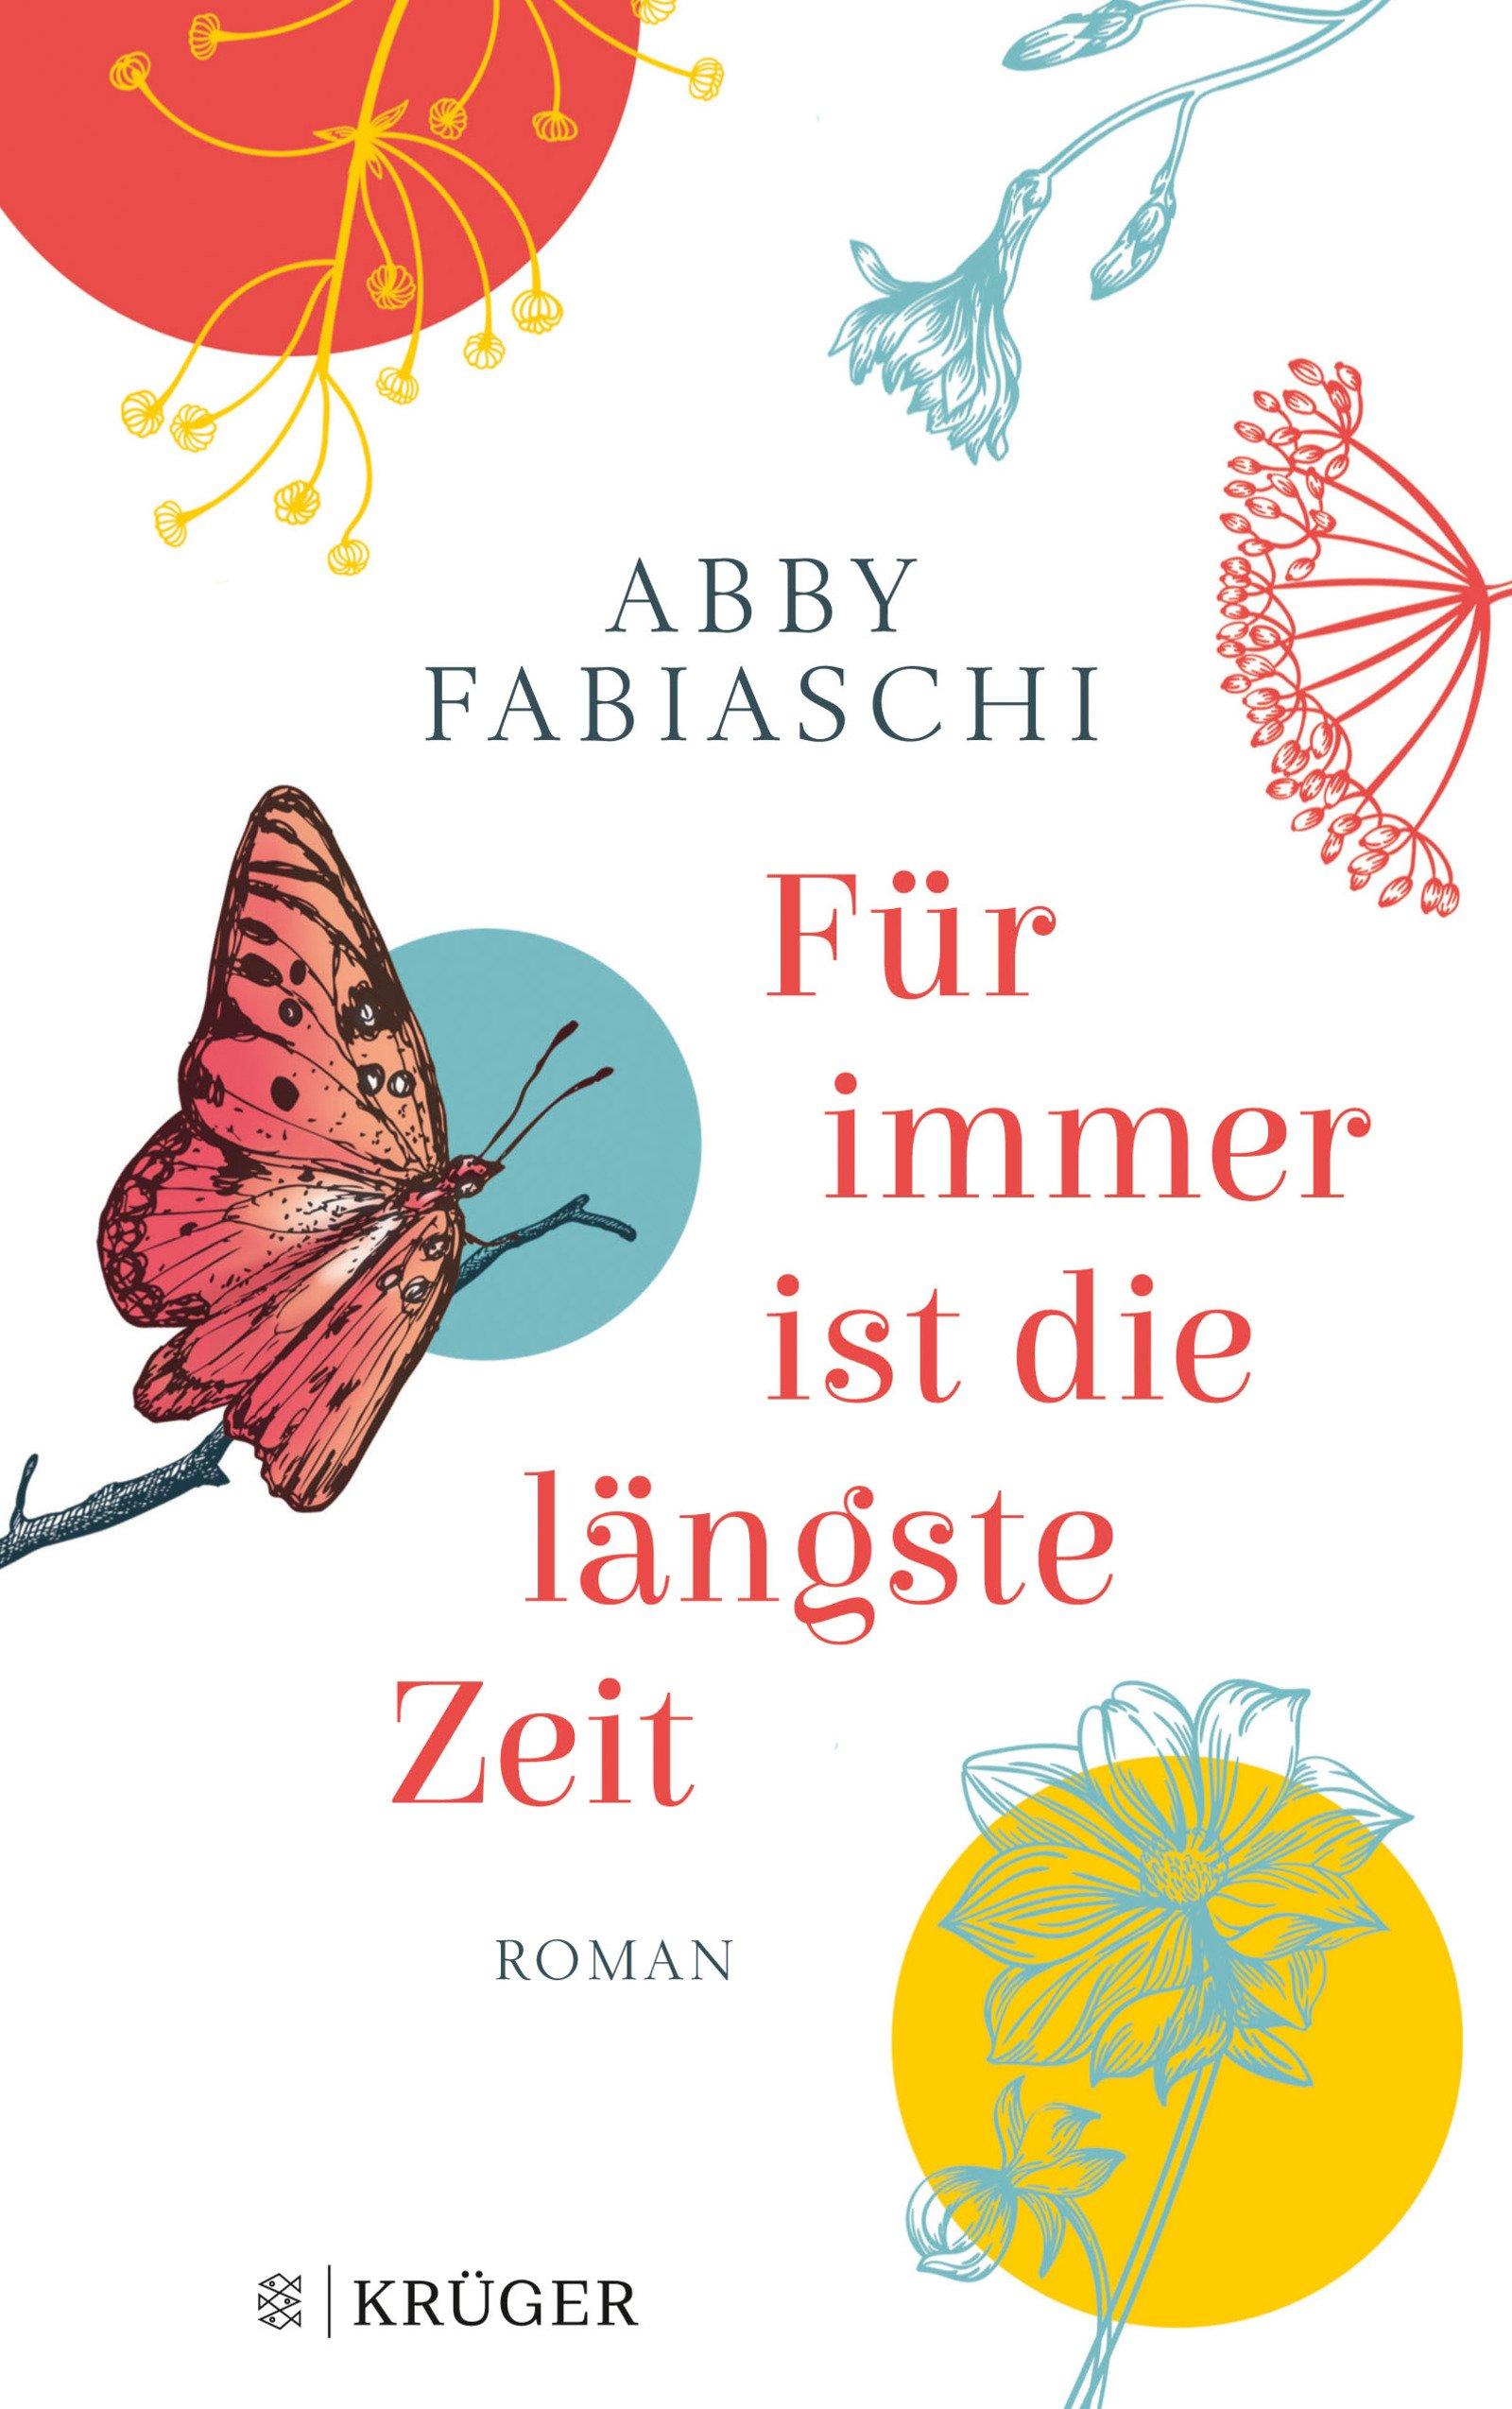 http://www.buecherfantasie.de/2018/03/rezension-fur-immer-ist-die-langste.html